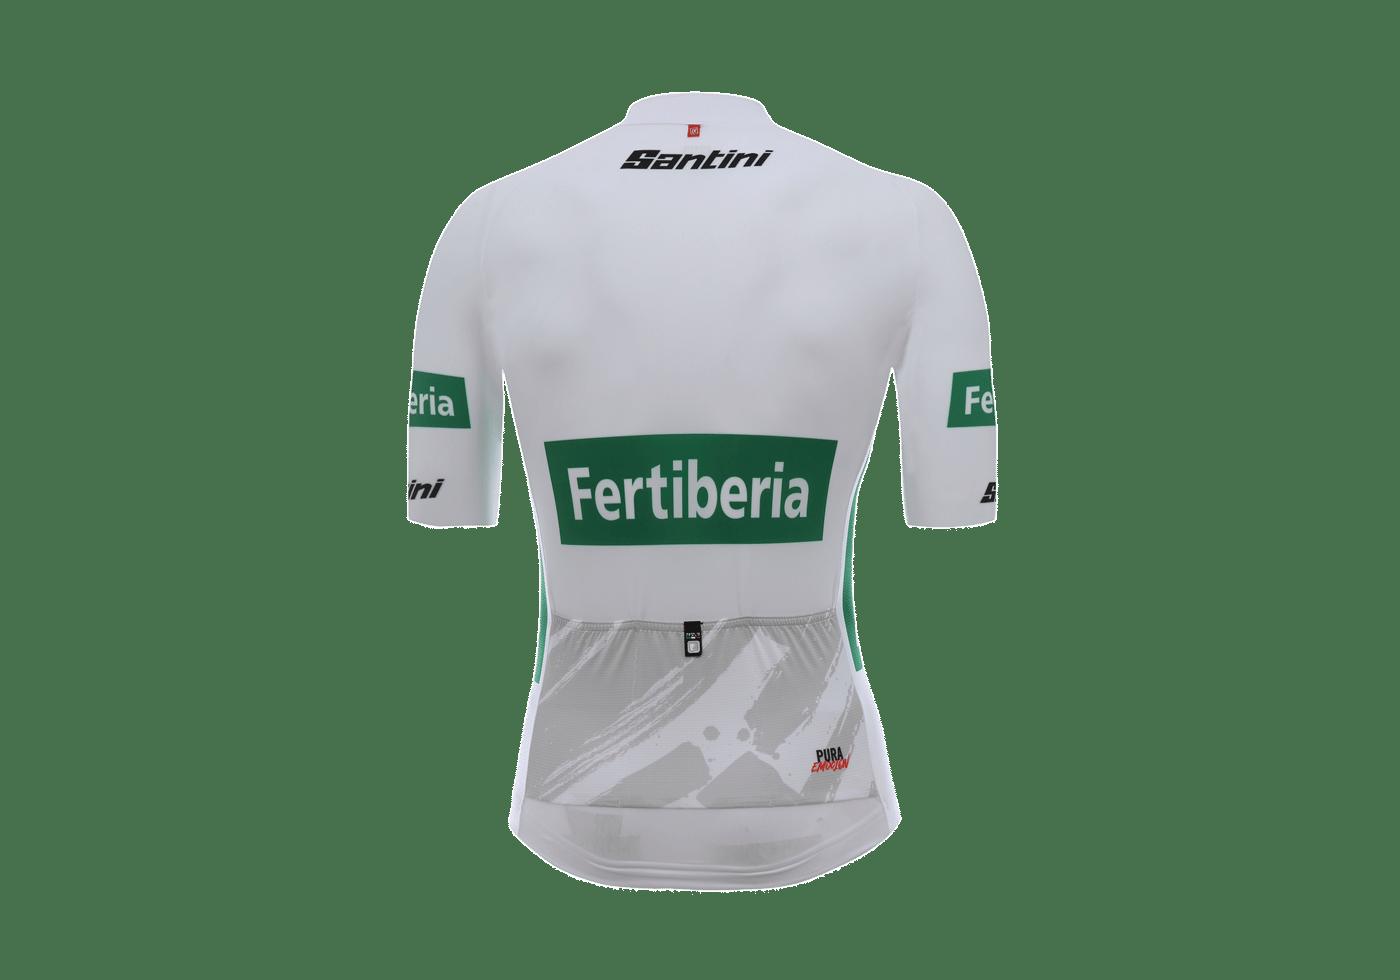 Maillot Blanco La Vuelta 2017 II